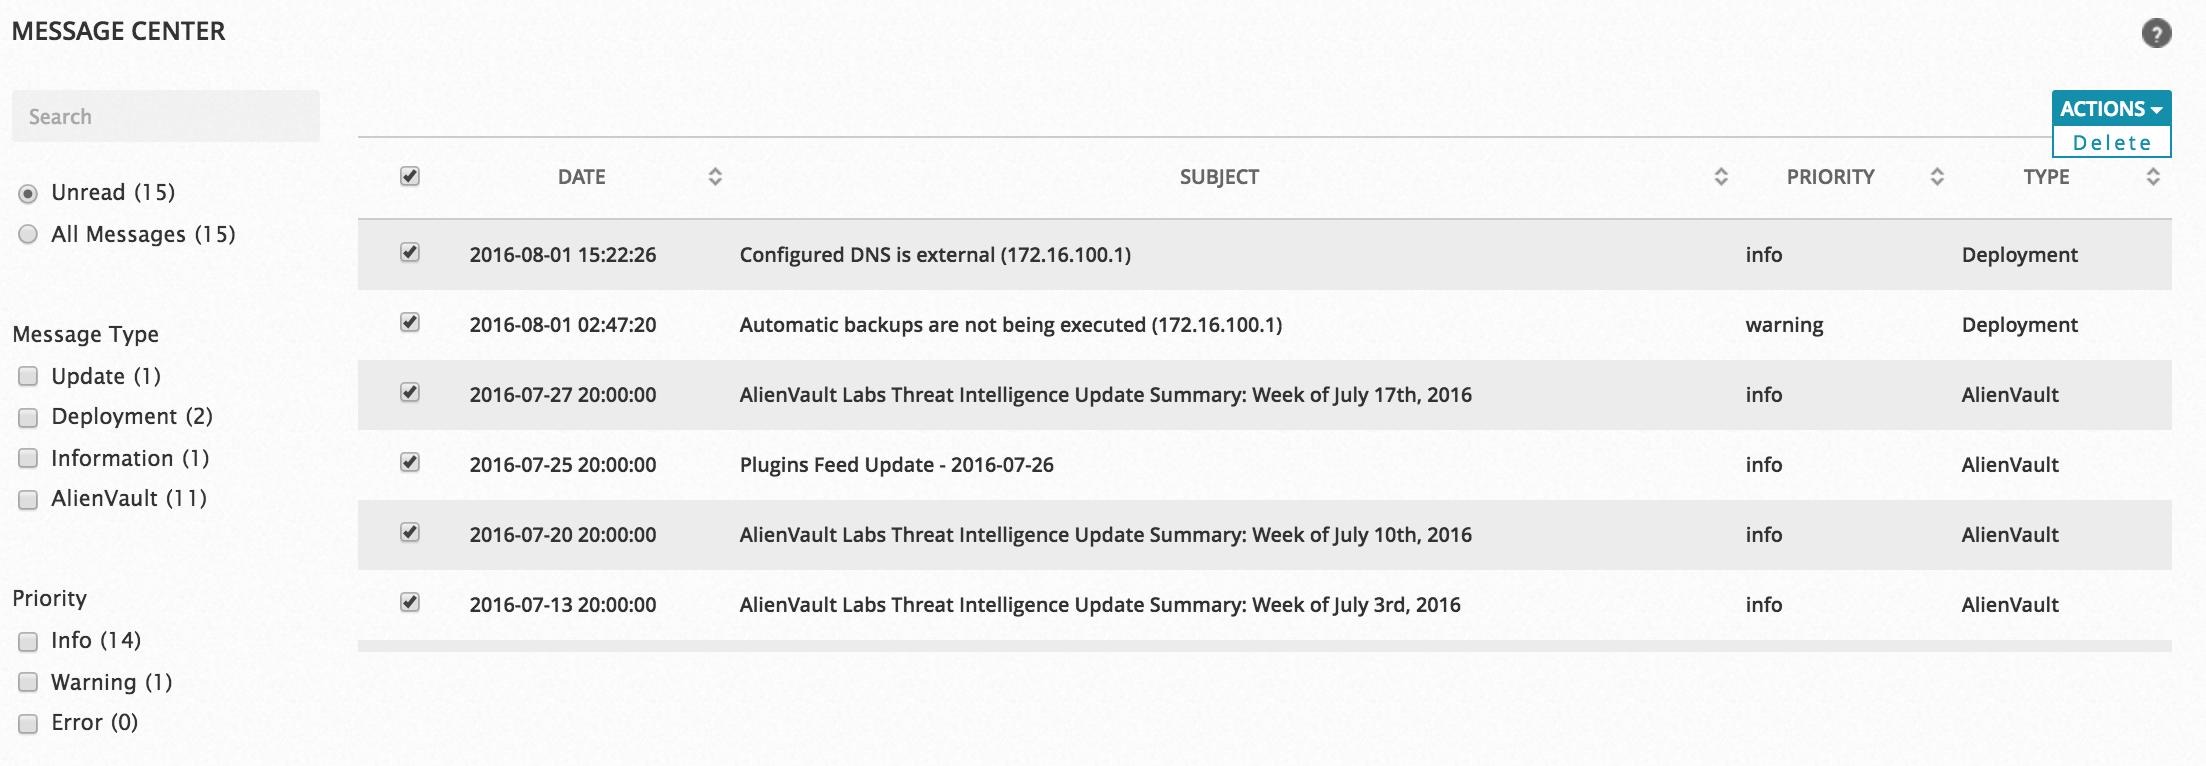 Bulk delete messages in the AlienVault Message Center